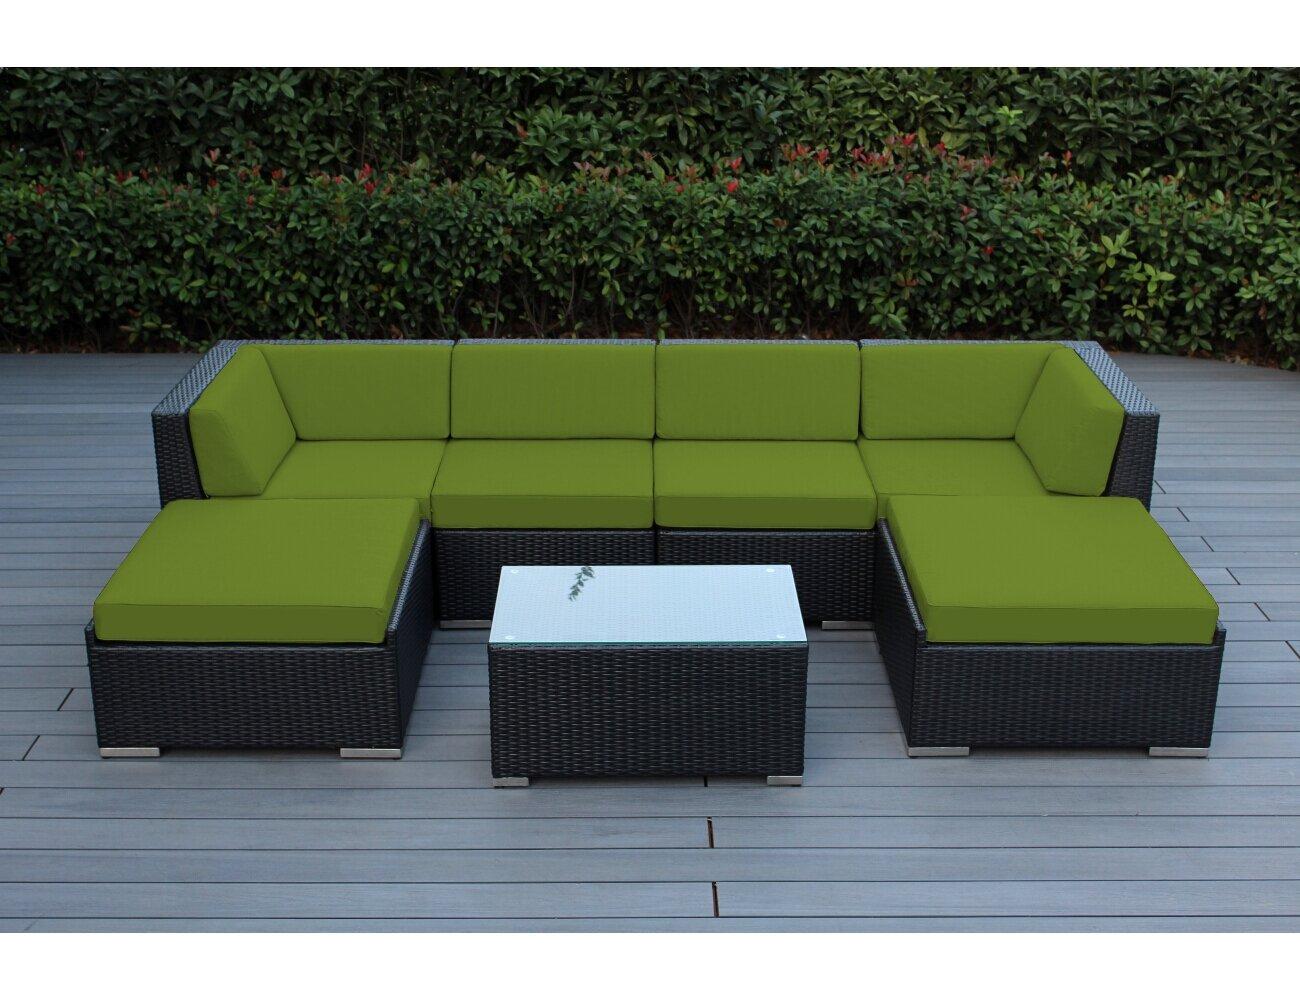 Table Baril wade logan baril 7 piece sofa set with cushions & reviews | wayfair